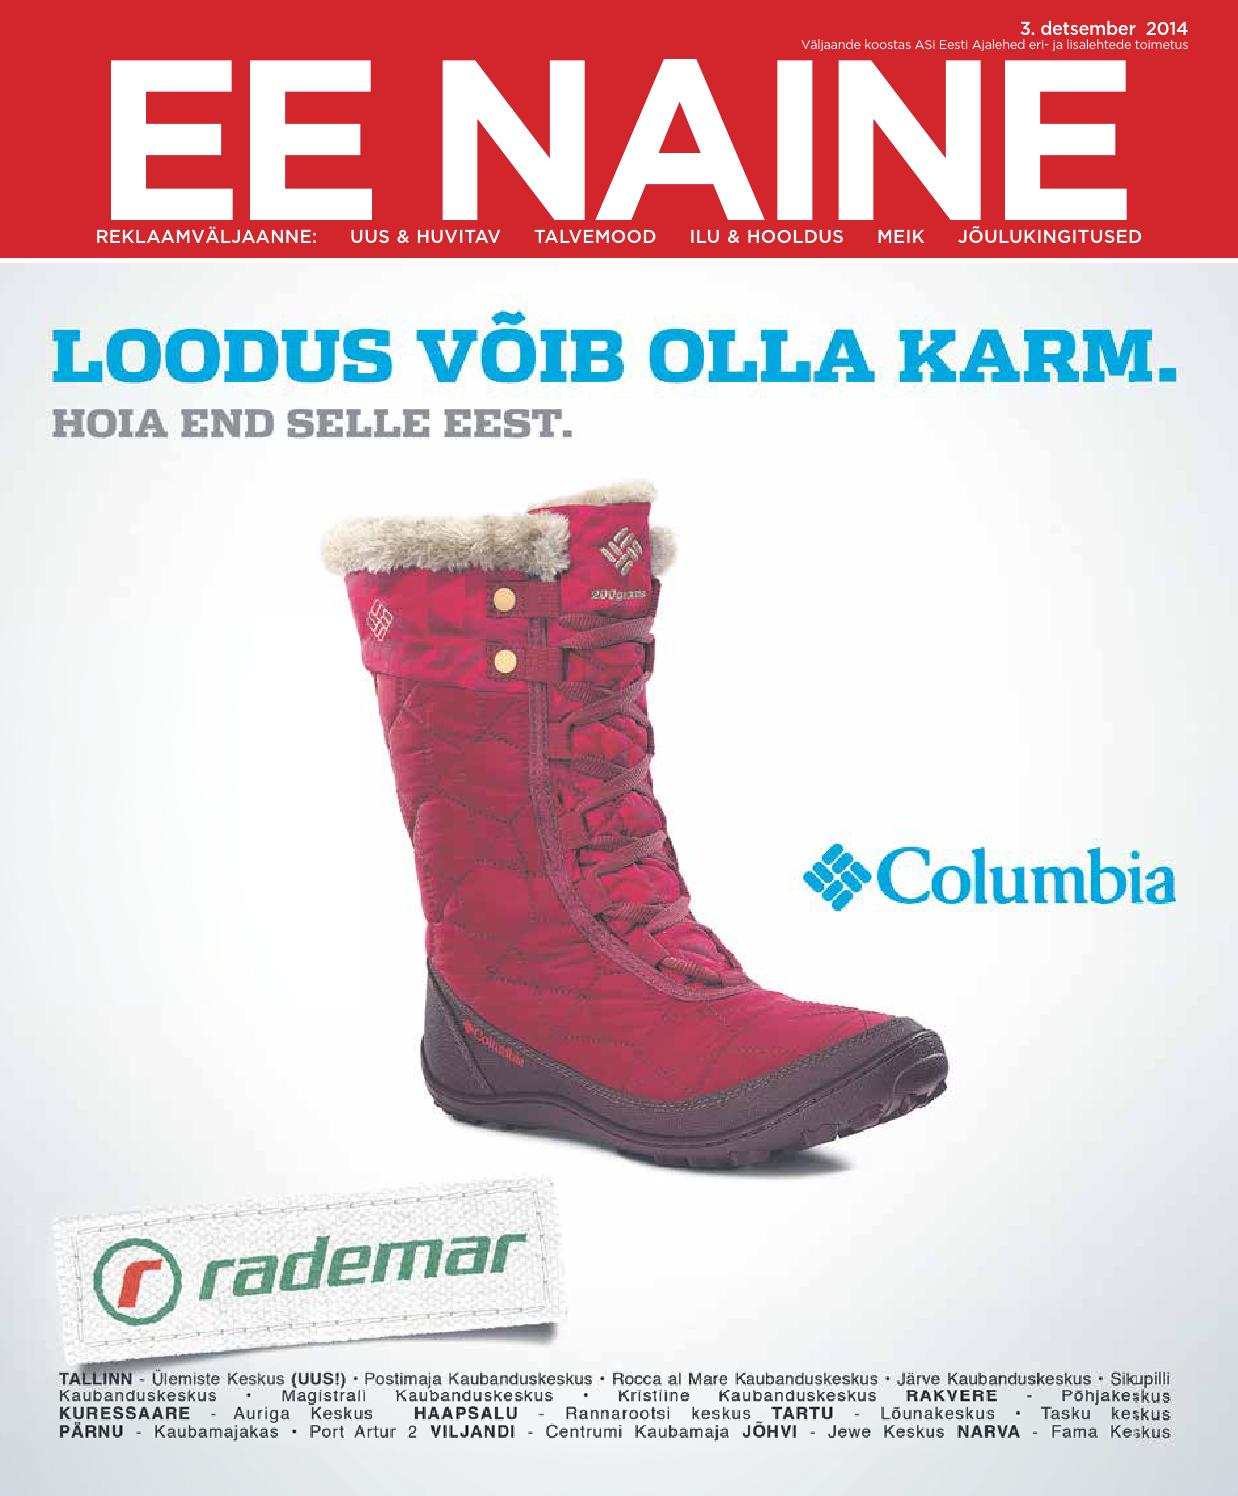 3a7eae16661 EE NAINE (detsember 2014) by AS Ekspress Meedia - issuu